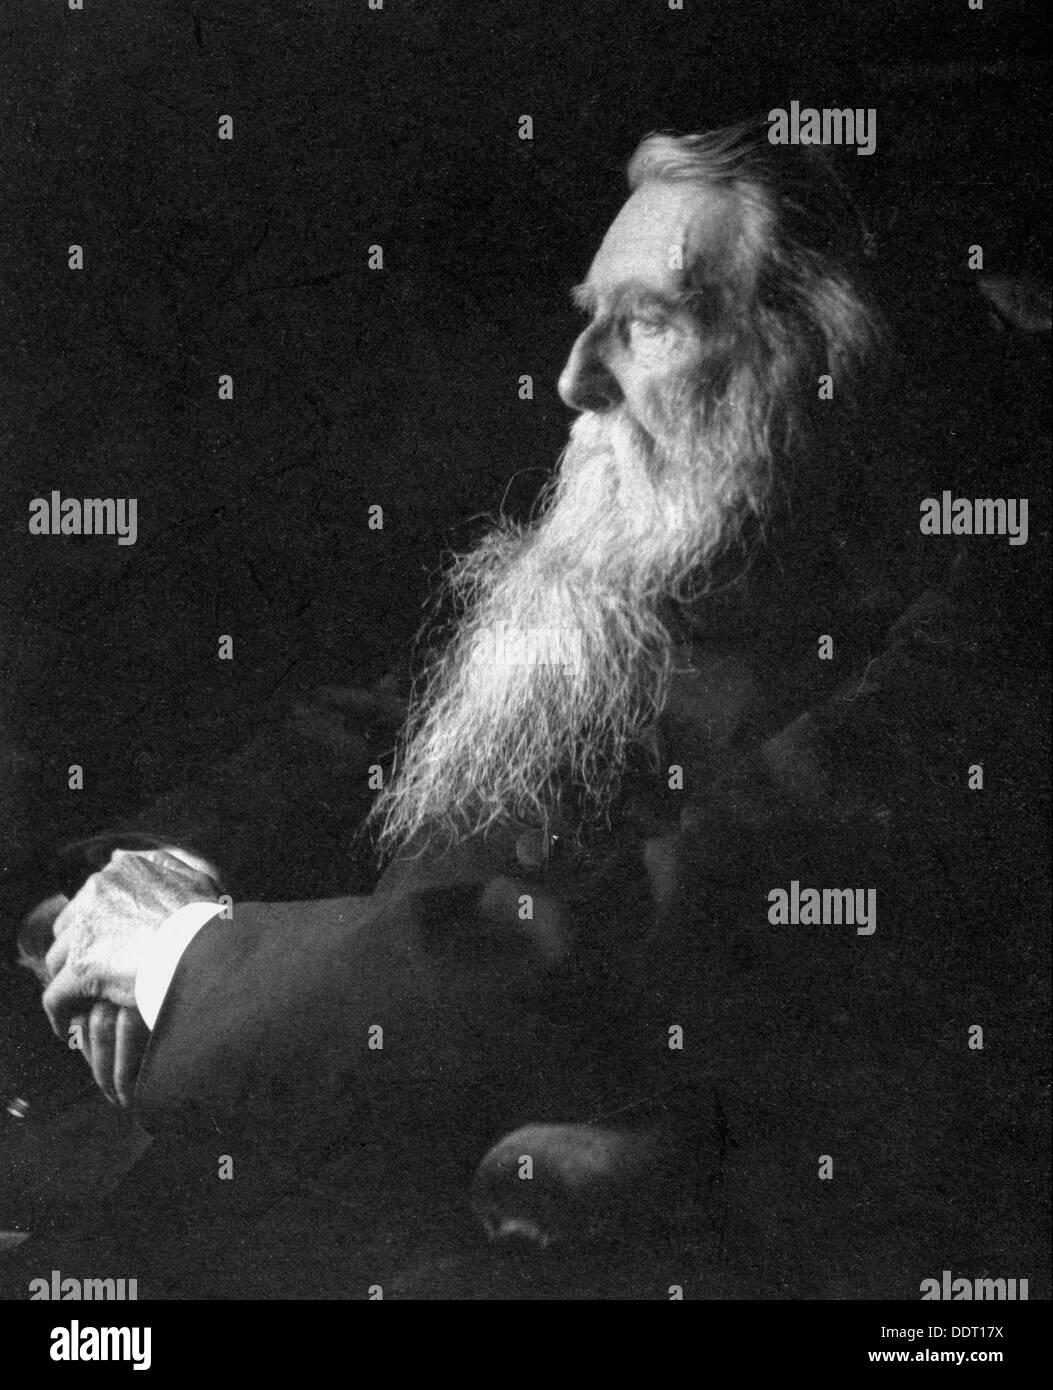 John Ruskin, artista inglese, poeta e critico, c1897. Artista: Emil Otto Hoppe Immagini Stock